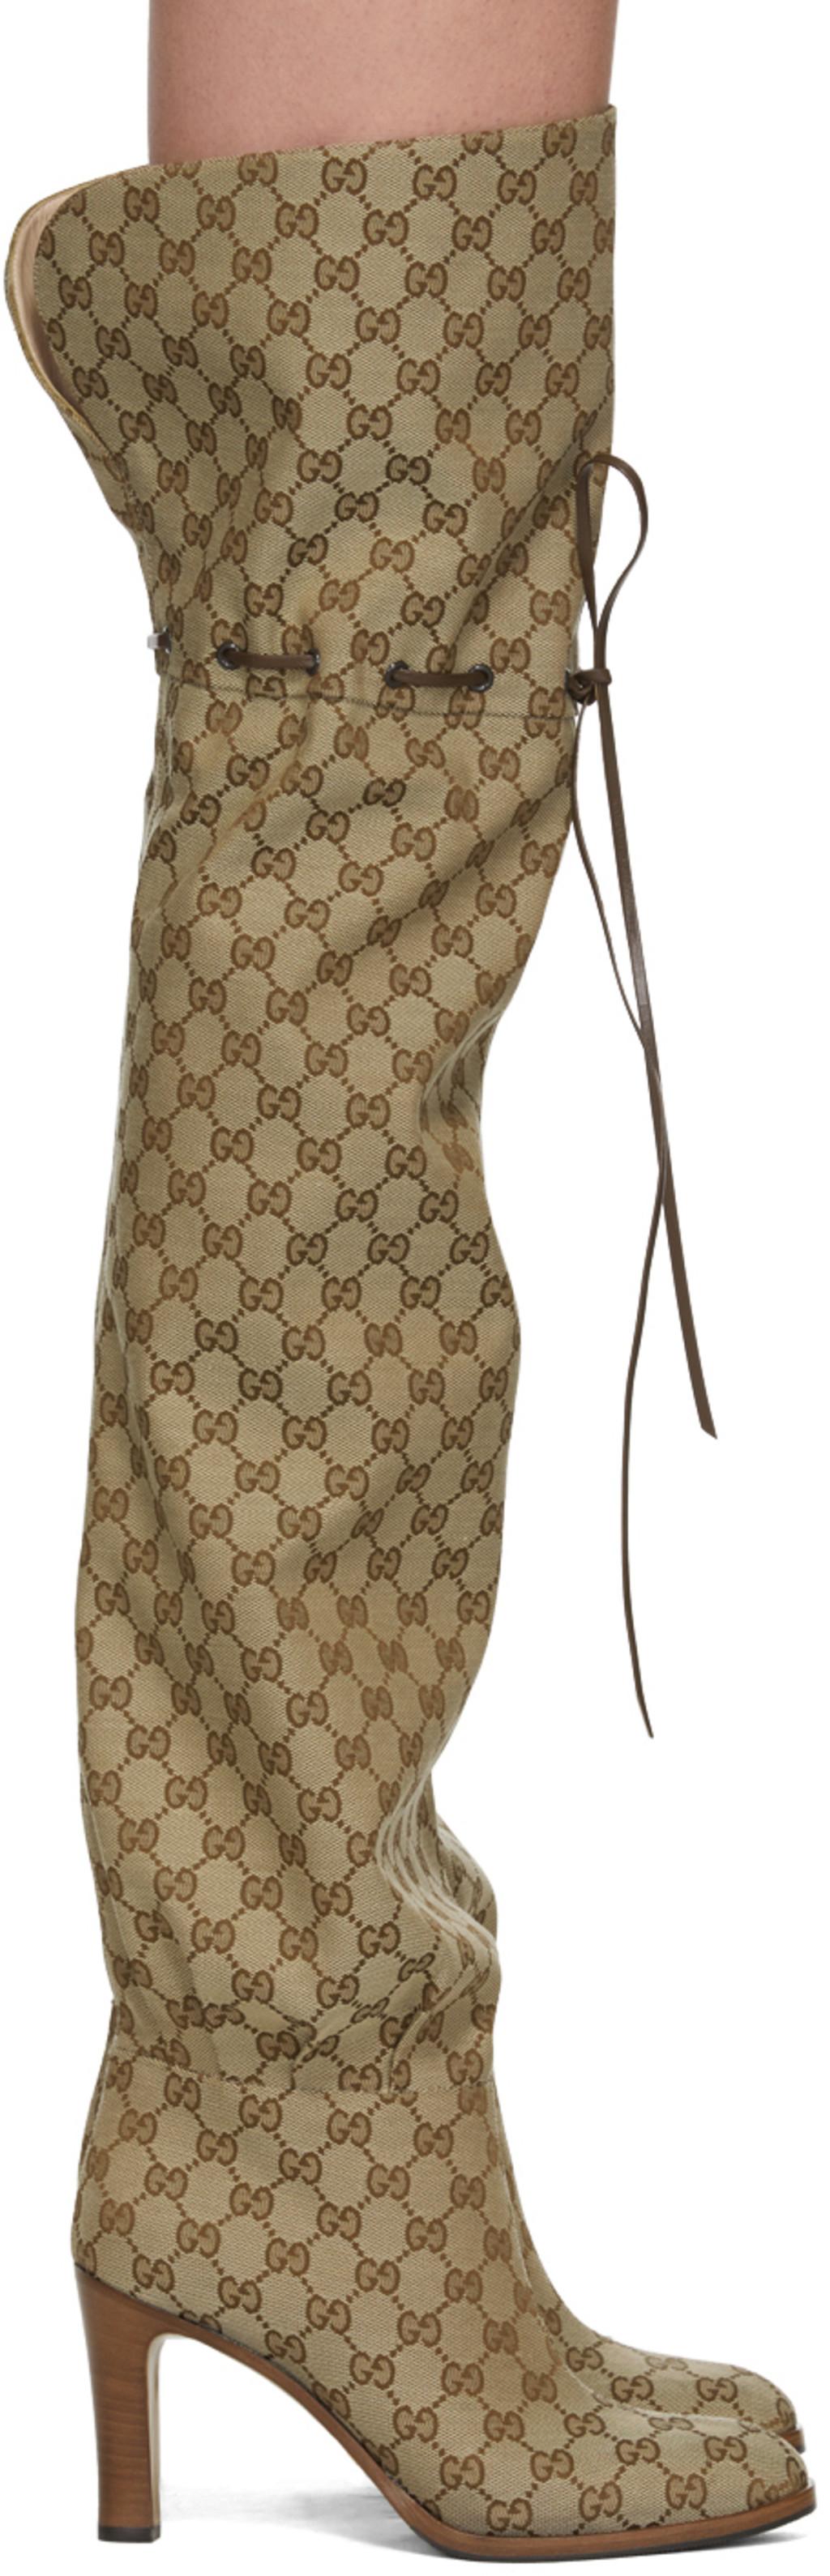 ac0071ba3246fc Gucci shoes for Women | SSENSE